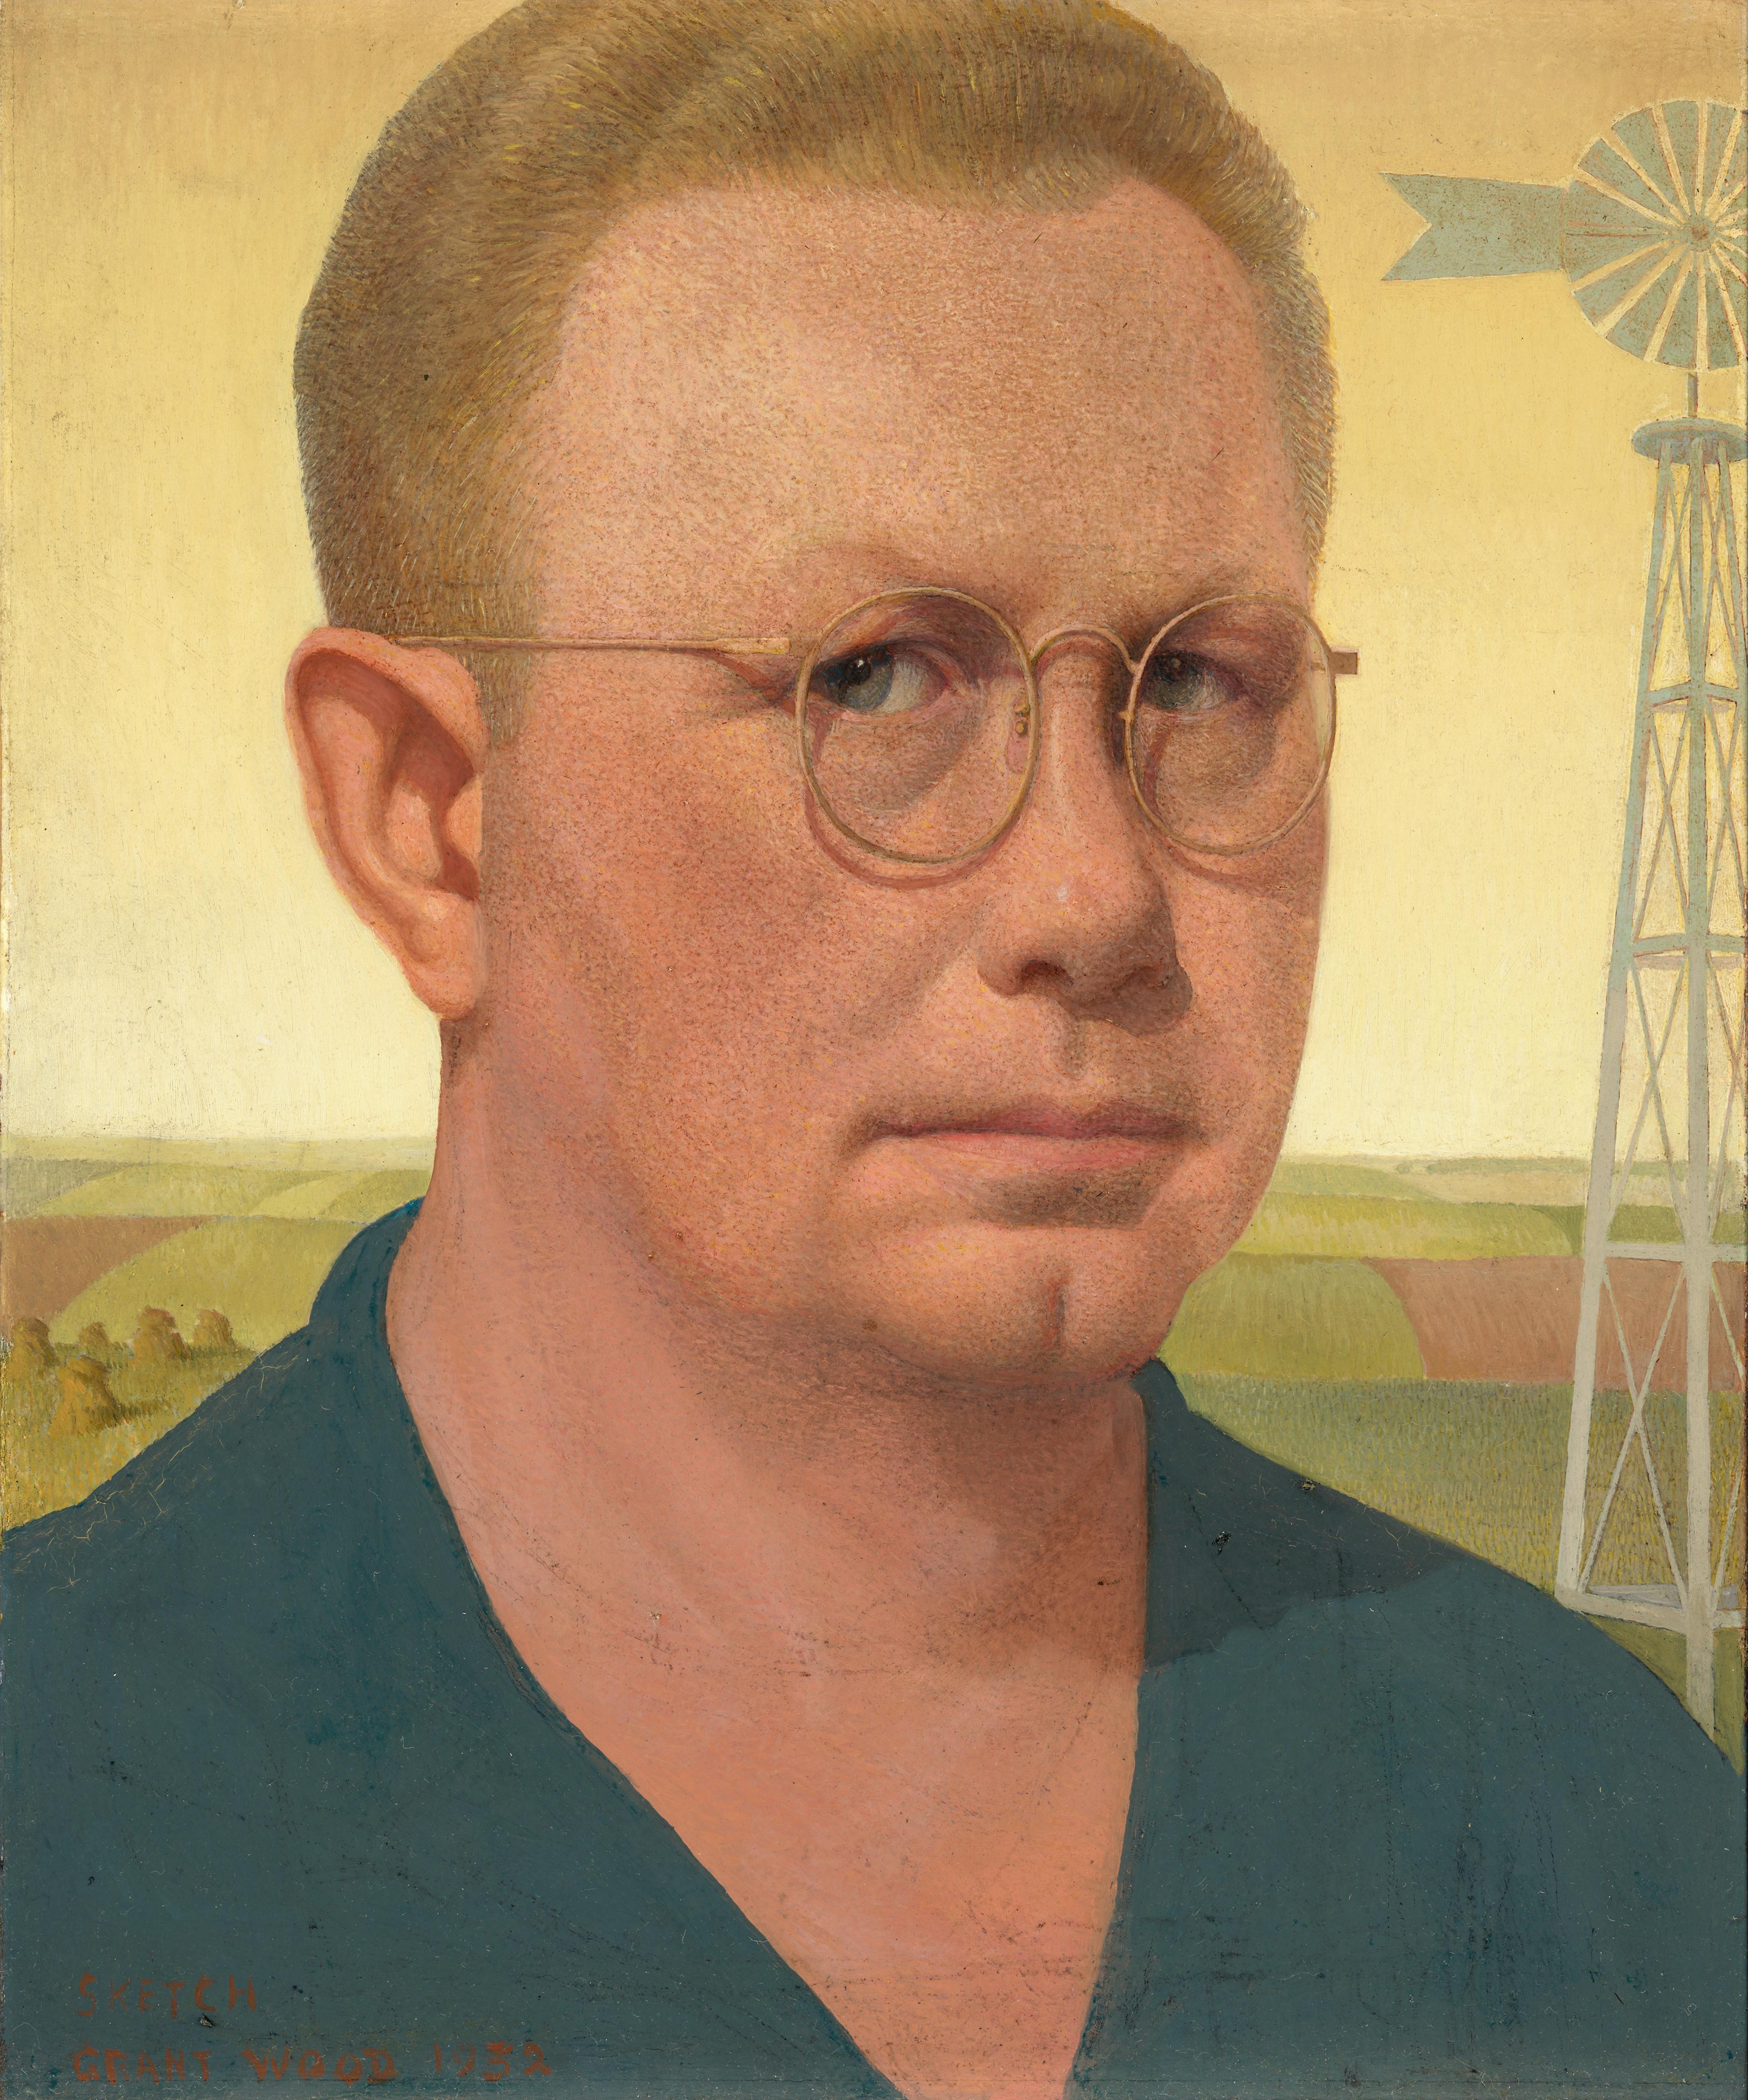 Wood reworked his self-portrait